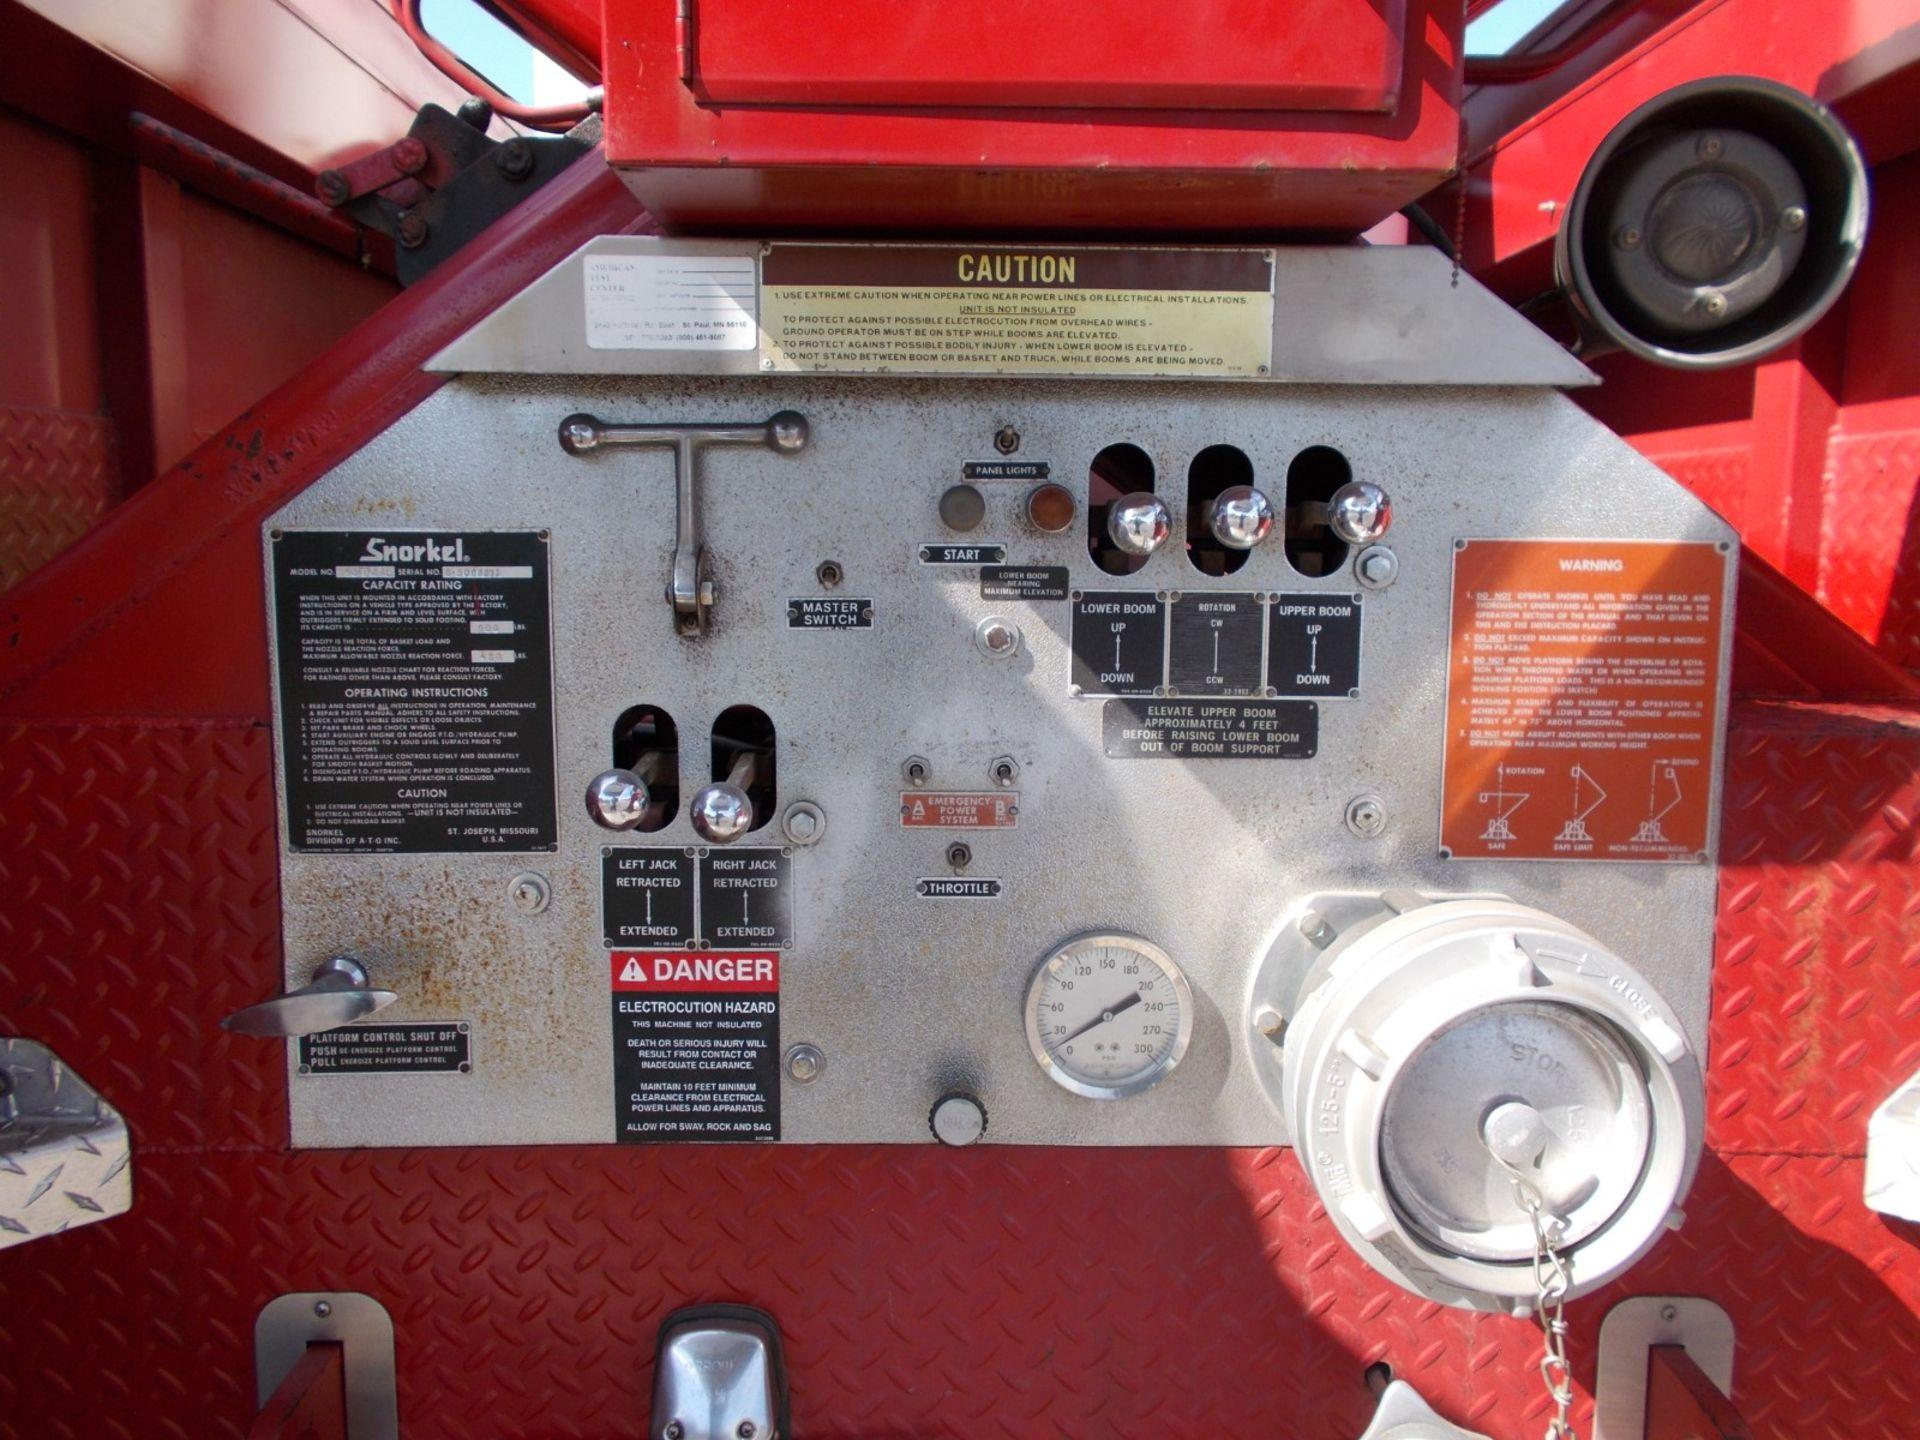 1978 HENDRICKSON 871-LPS SNORKEL FIRE TRUCK, U.S. IMPORT, 7.0 LITRE DETROIT DIESEL ENGINE *PLUS VAT* - Image 14 of 22